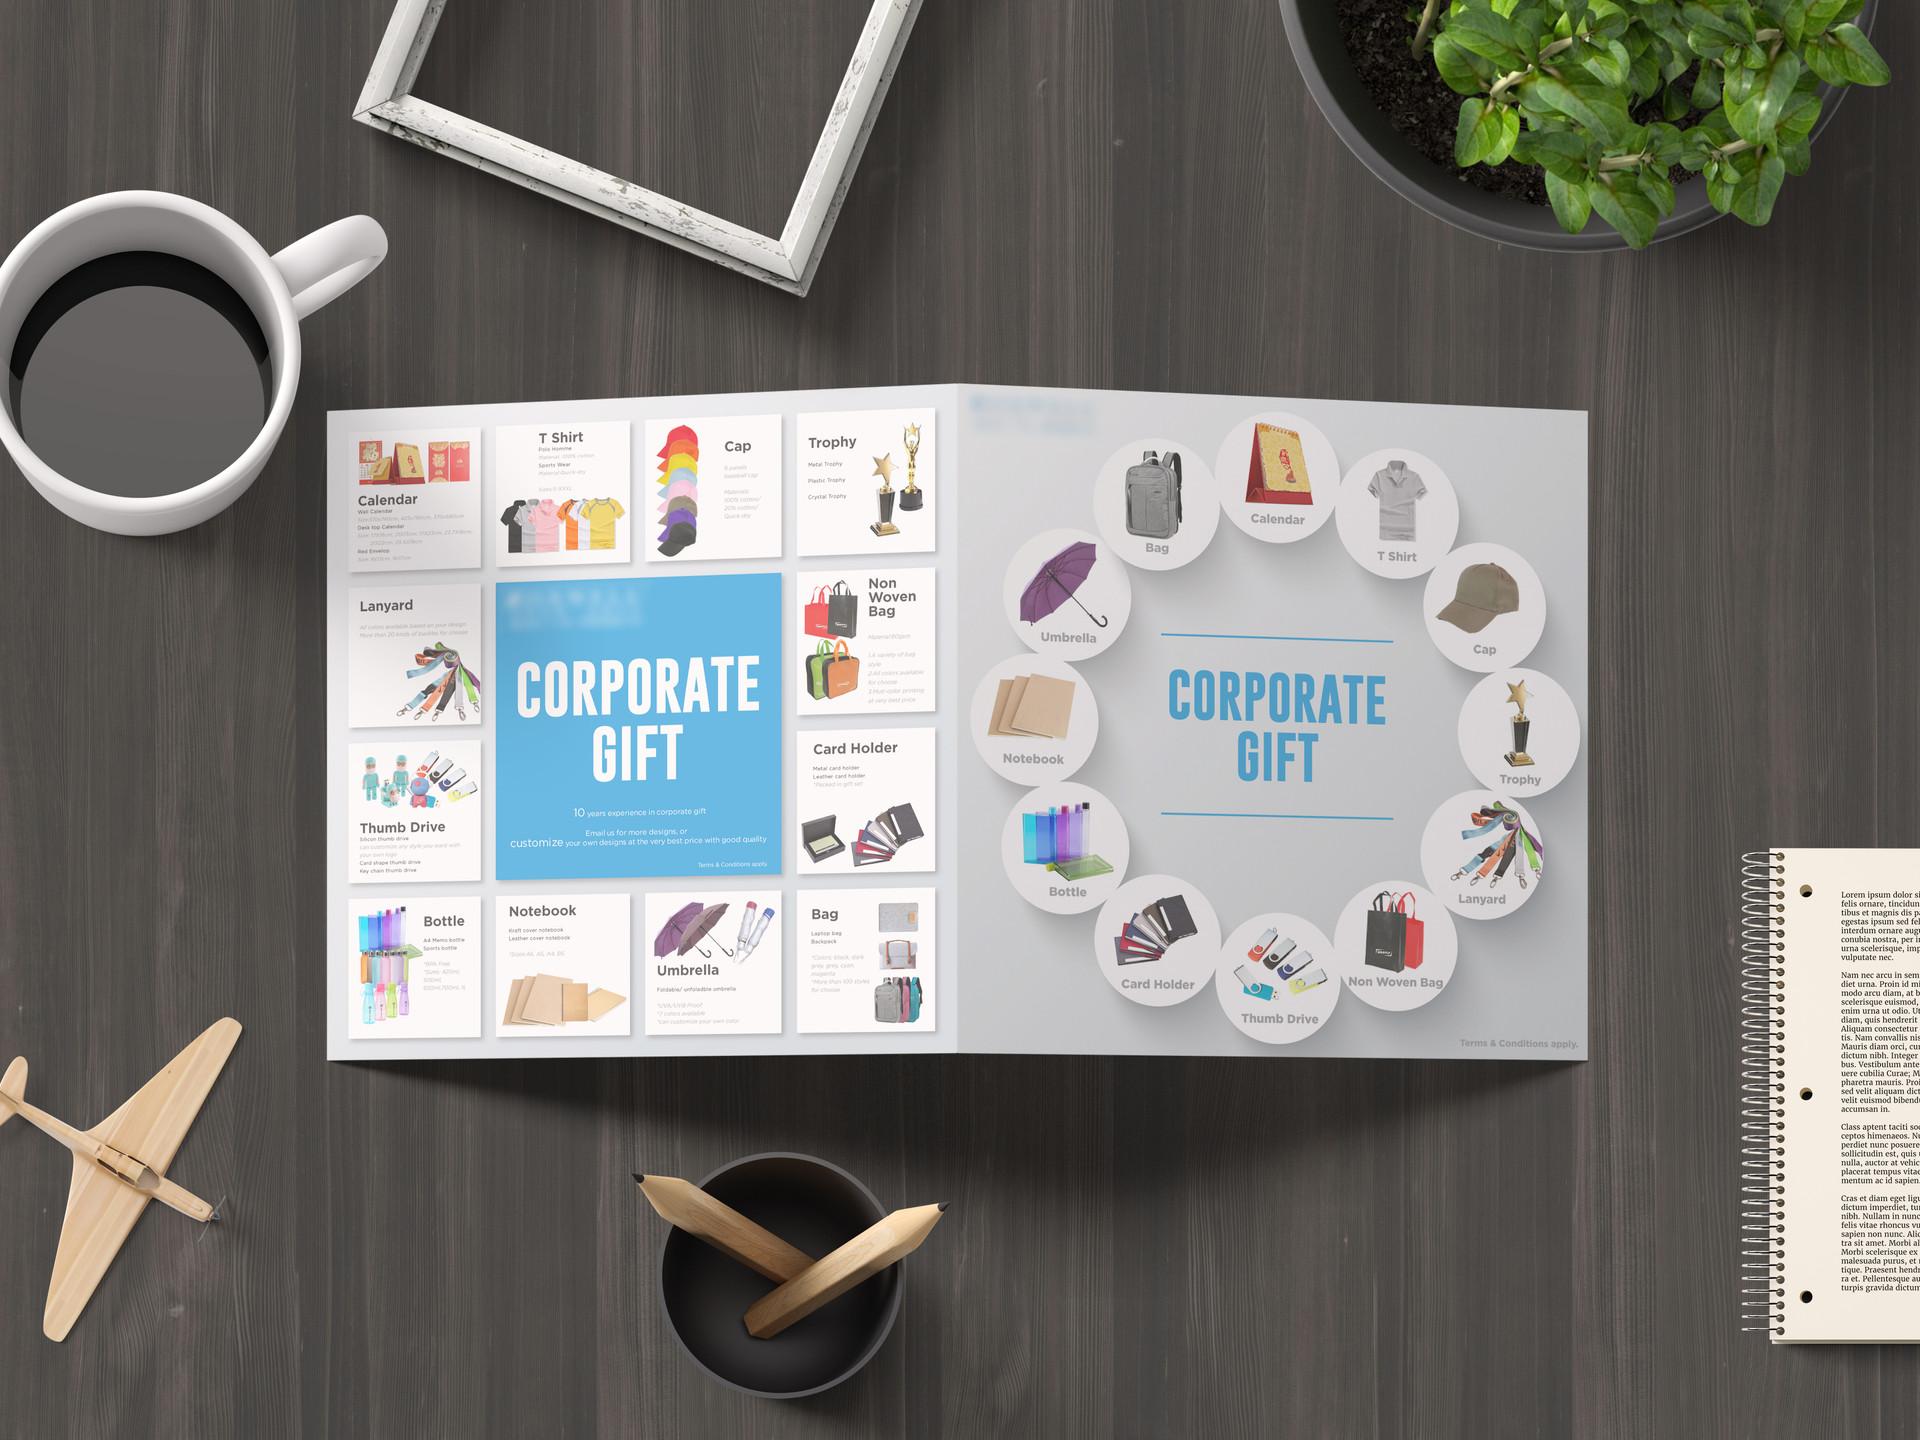 corporate-gift-poster.jpg